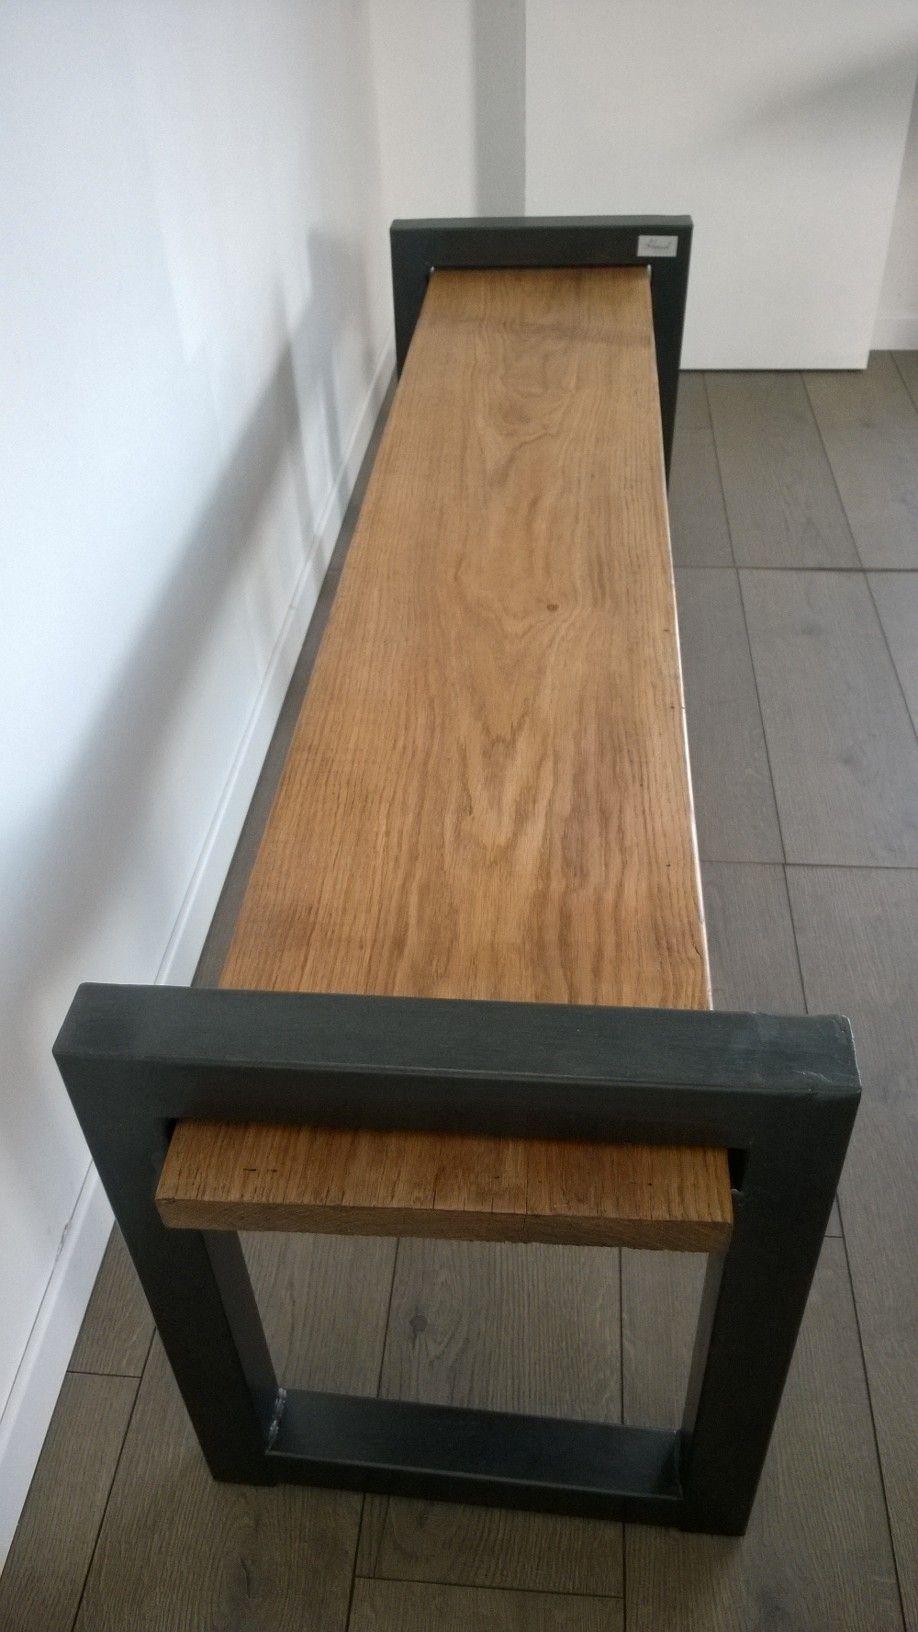 banc industriel banc bois et m tal banc vintage banc. Black Bedroom Furniture Sets. Home Design Ideas